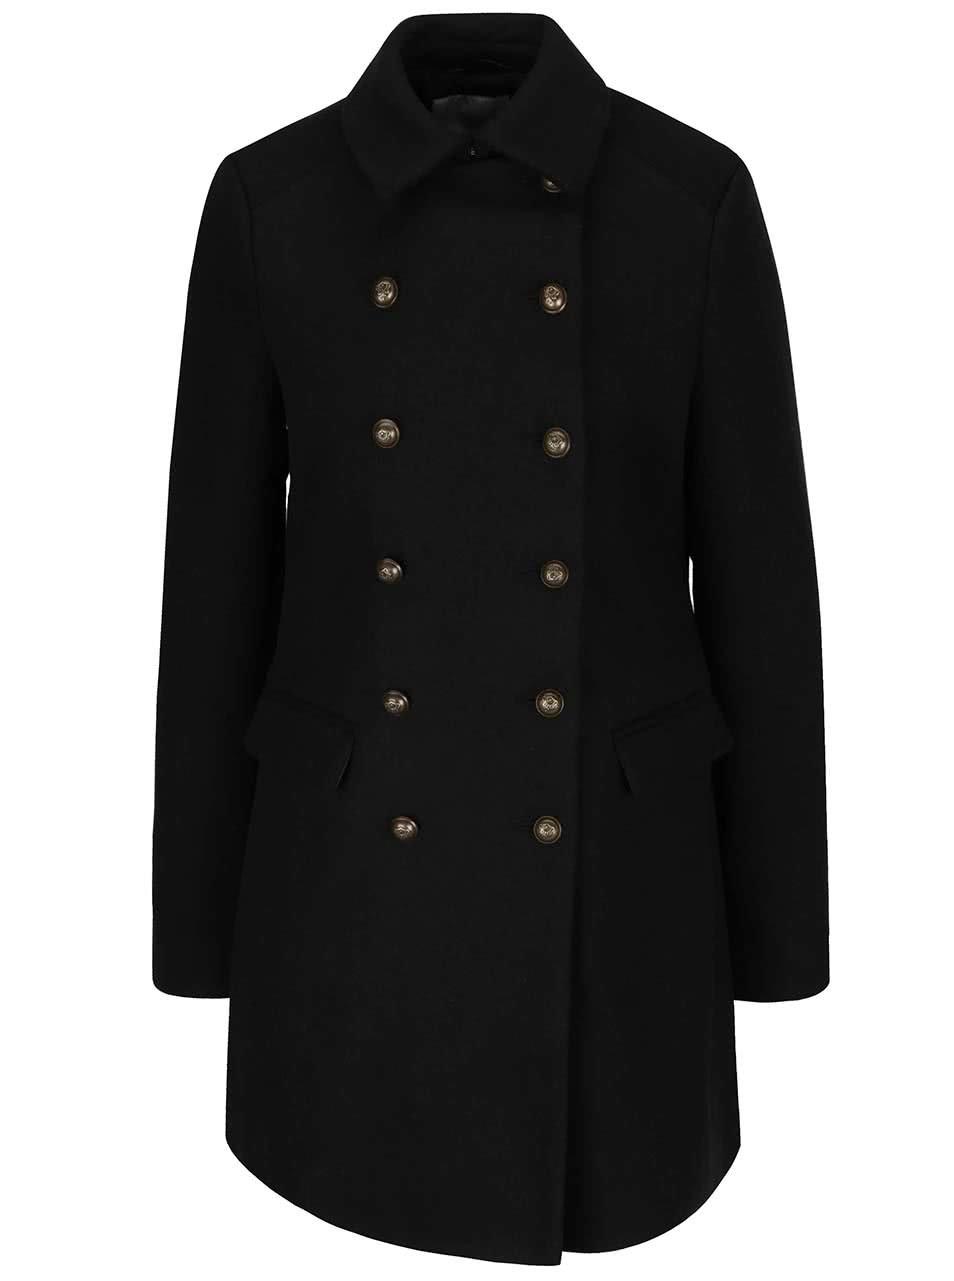 Černý kabát s dvouřadým zapínáním Vero Moda Marina